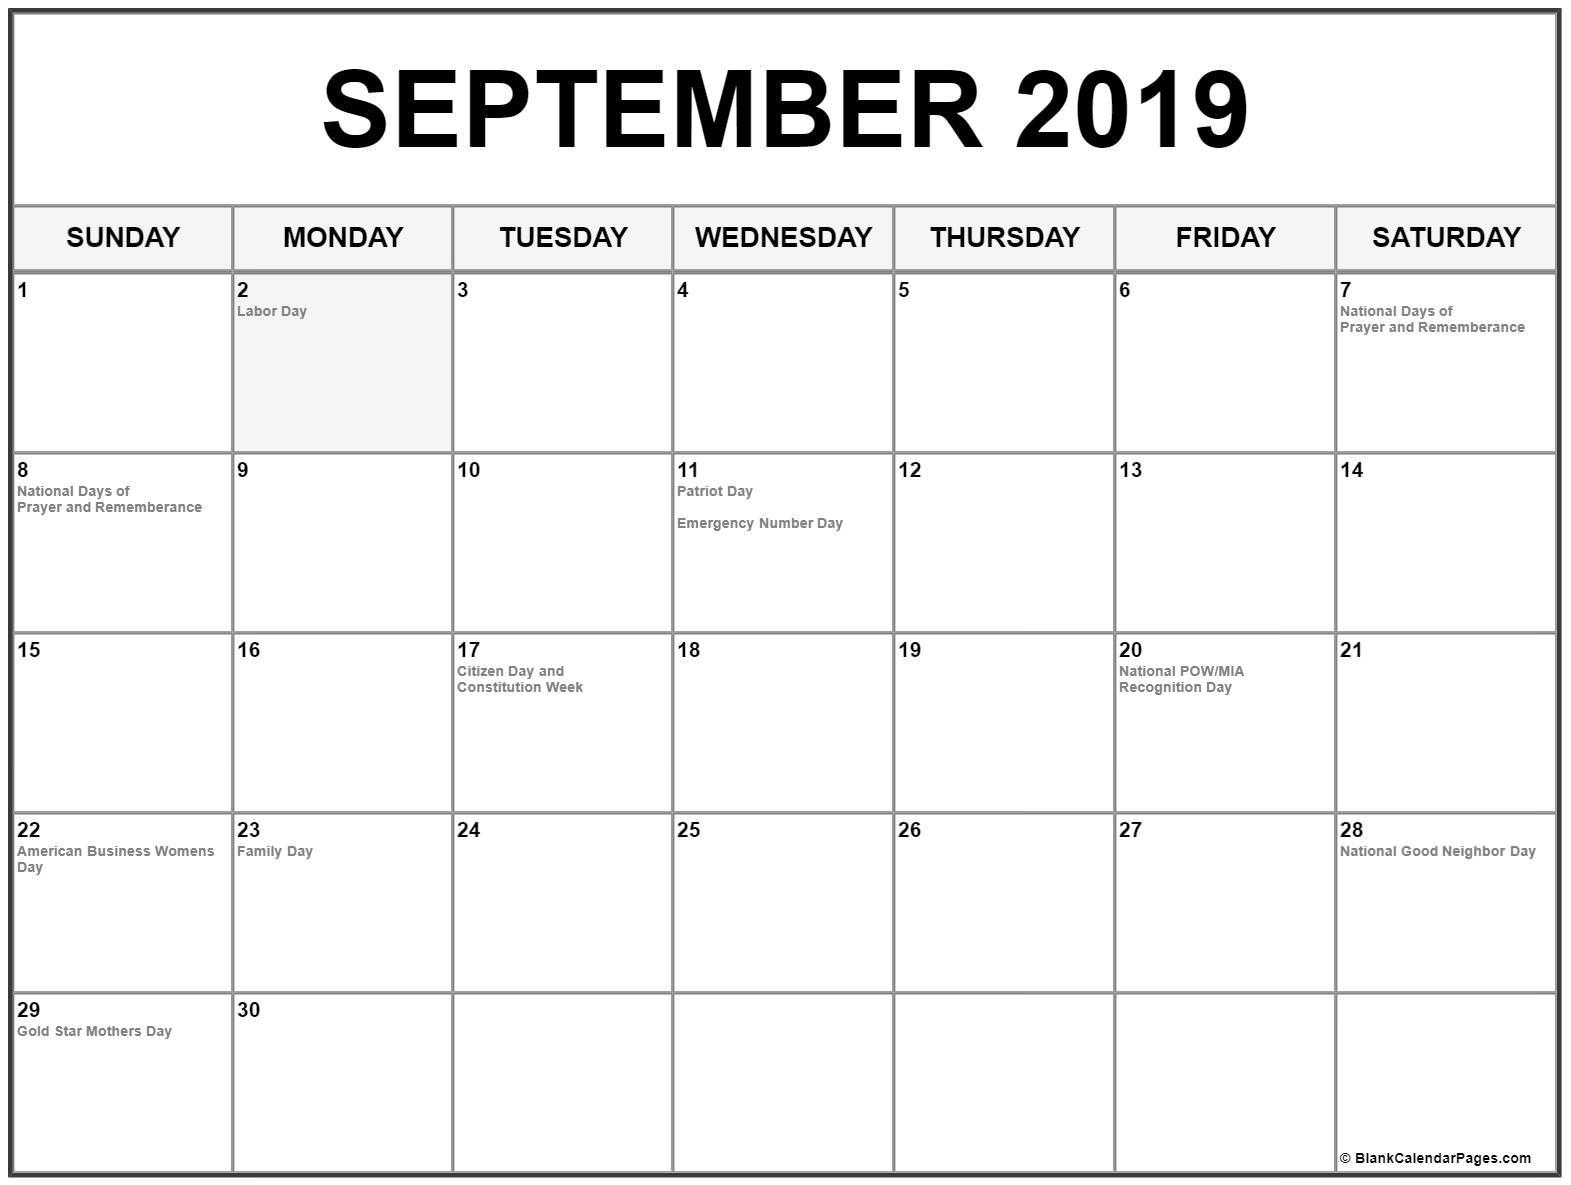 September 2019 Calendar US Holidays